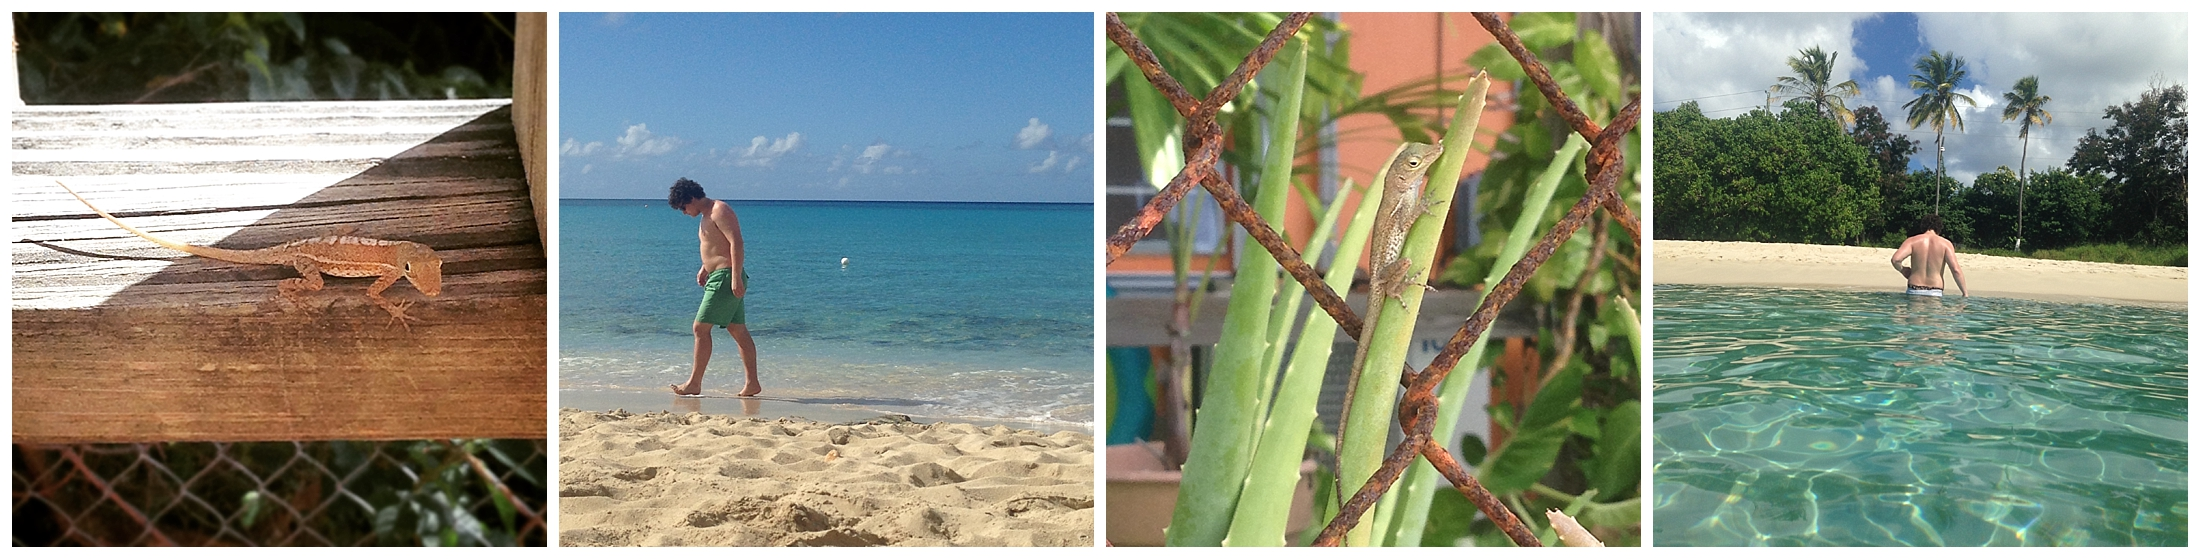 St-Croix-Trip-Itinerary-SSPTravels10.jpg